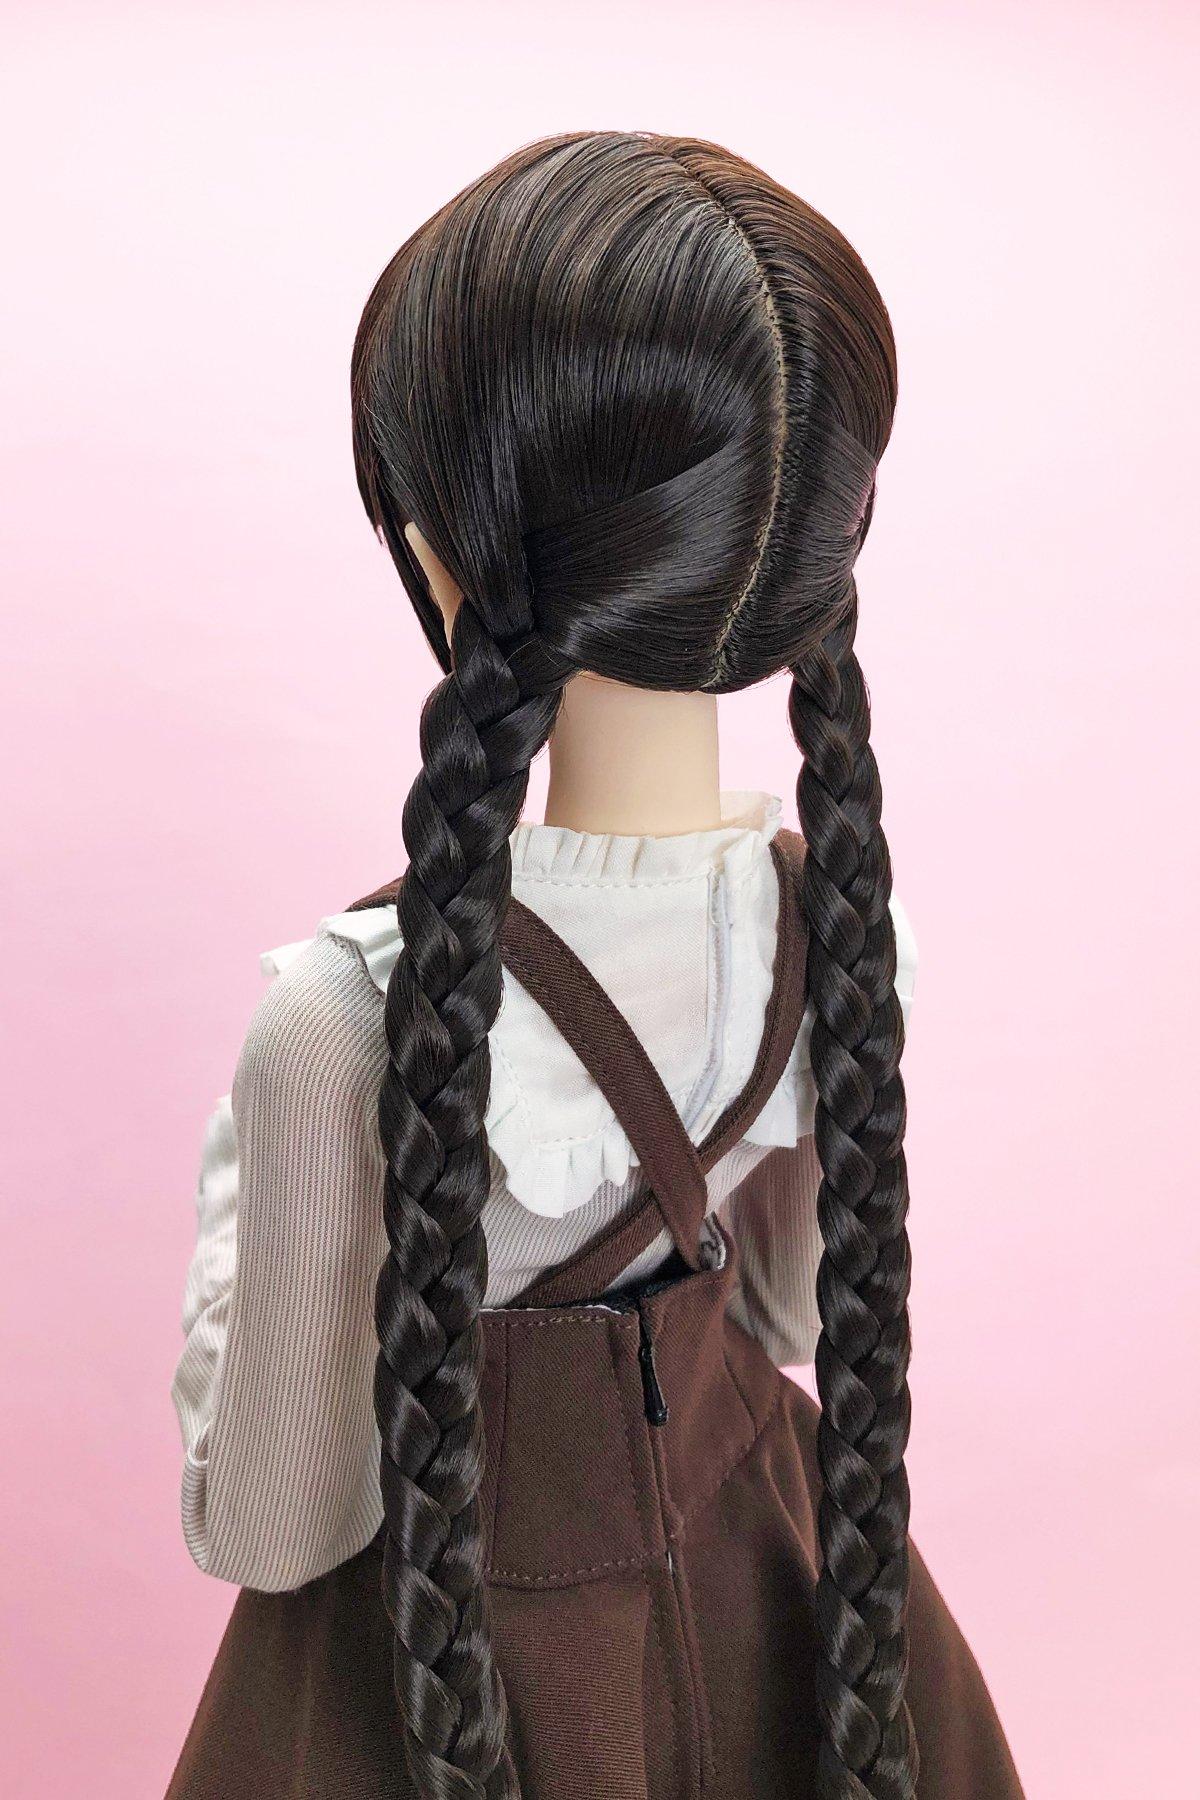 [Azone] 1/3 Happiness Clover - Yukari - Kazuharu Kina School Uniform Collection  Img_2078